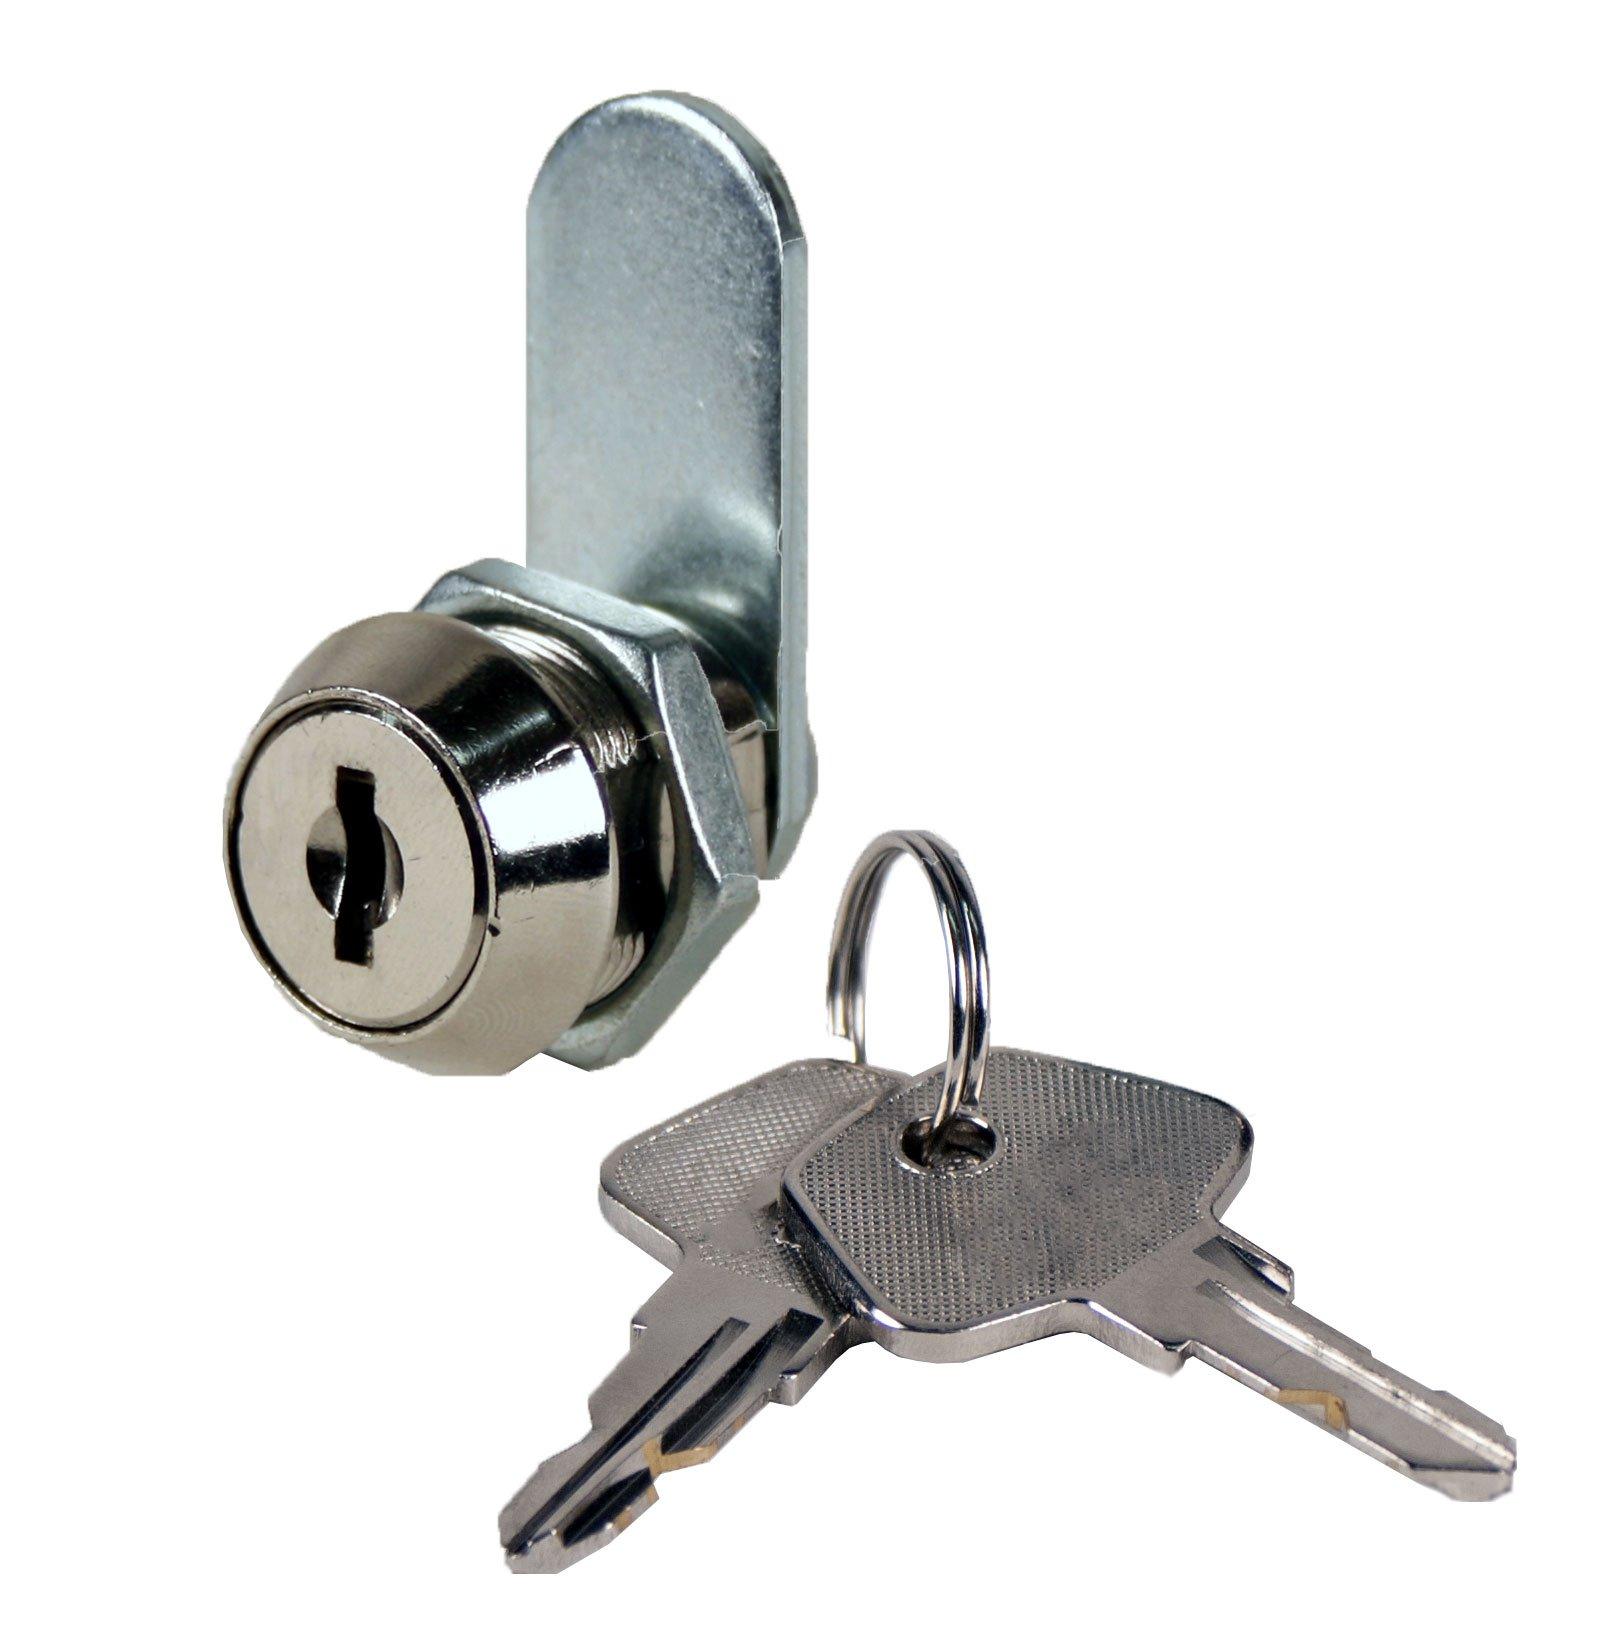 FJM Security 3403AS-KA High Security Disc Tumbler Cam Lock with 5/8'' Cylinder and Chrome Finish, Keyed Alike